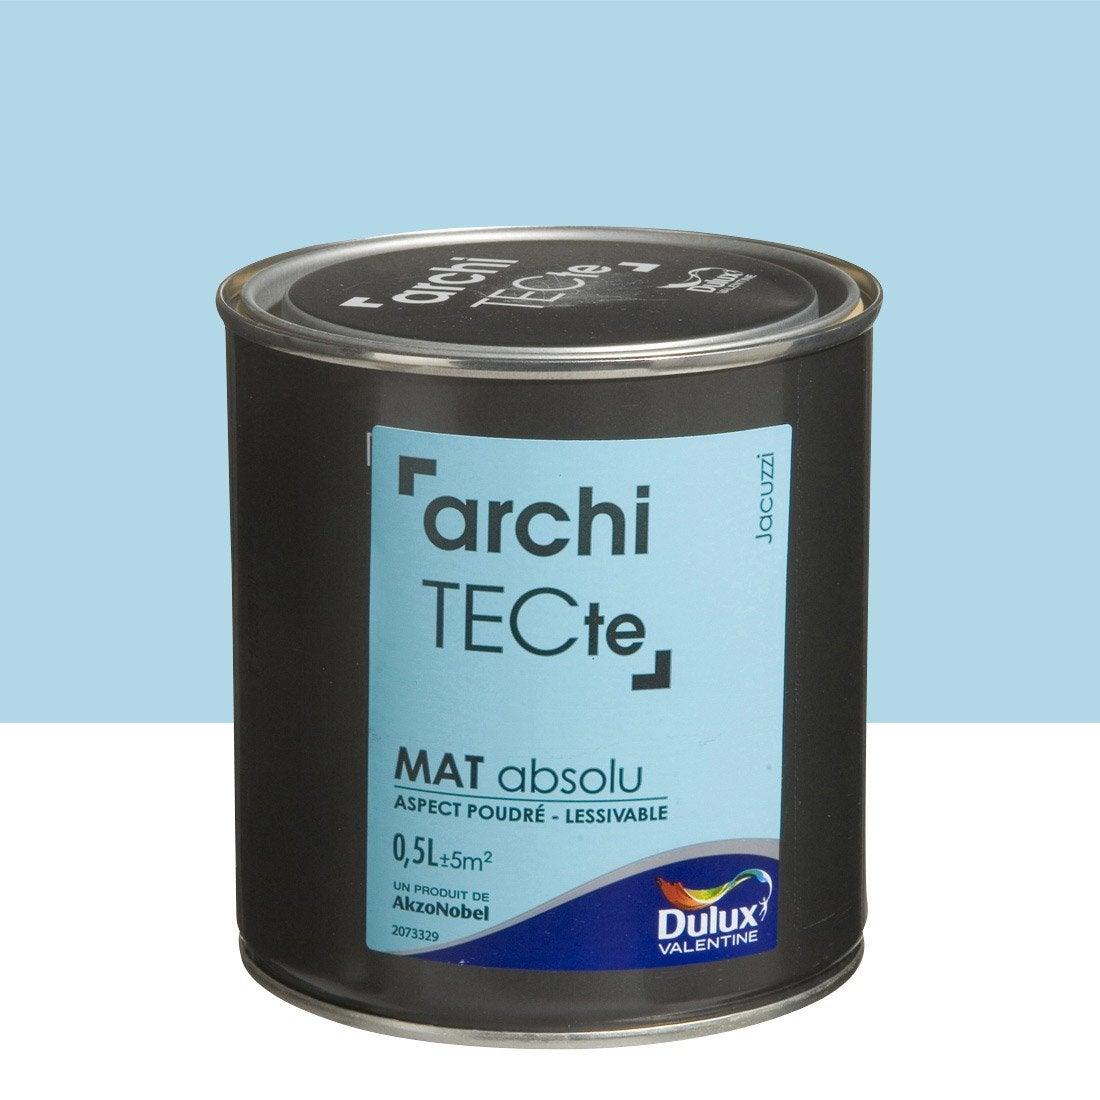 peinture bleu jacuzzi dulux valentine architecte 0 5 l leroy merlin. Black Bedroom Furniture Sets. Home Design Ideas